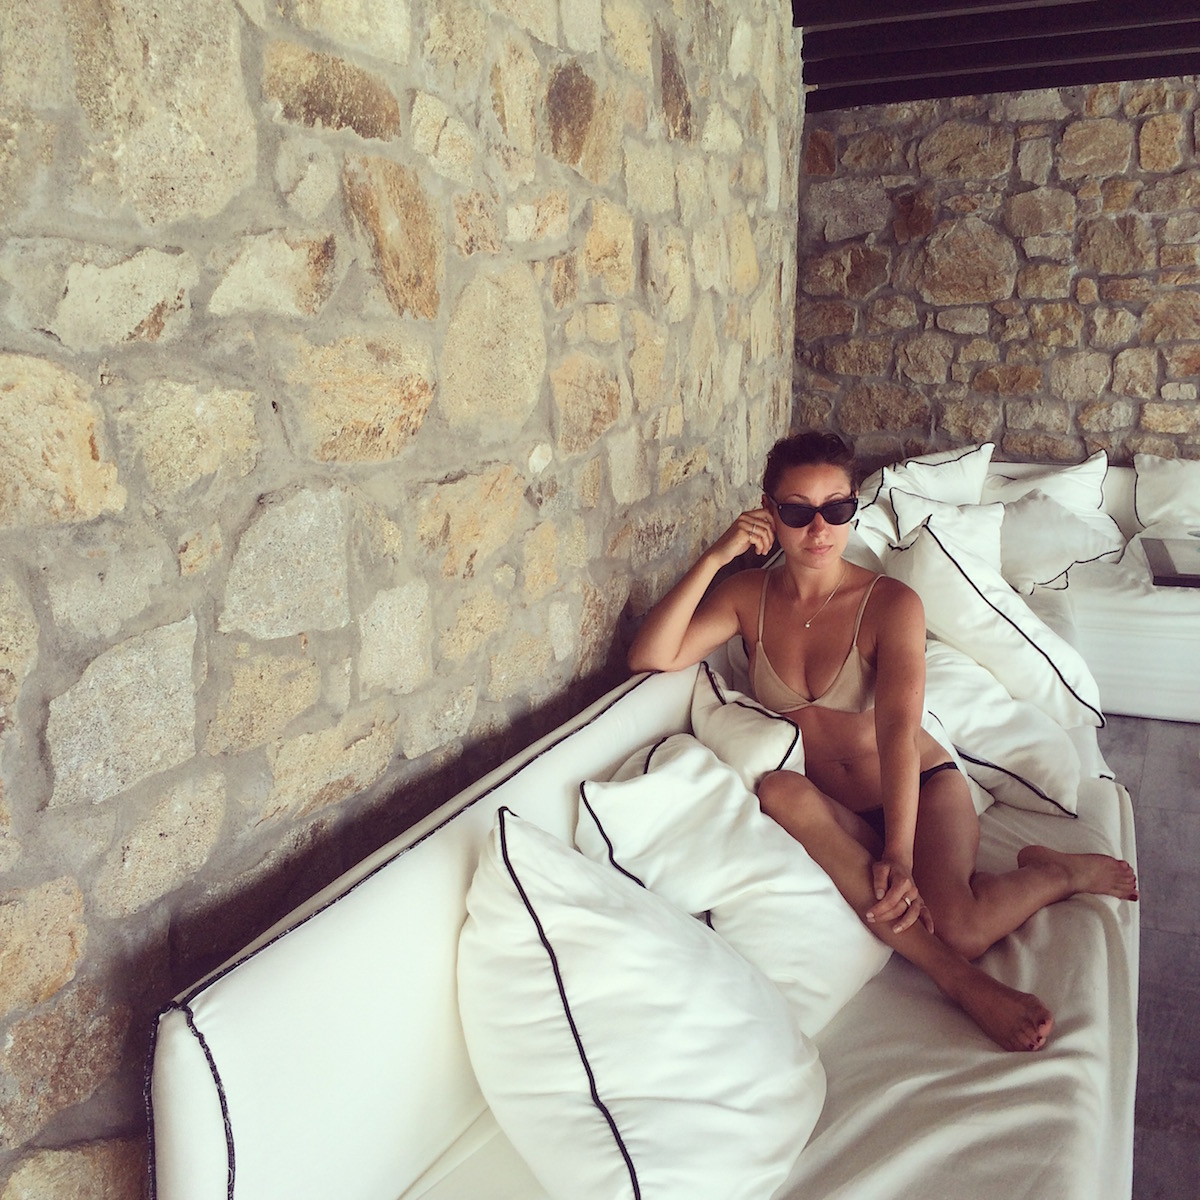 Greece_Jessika_Querelles_voyage_Mykonos 14